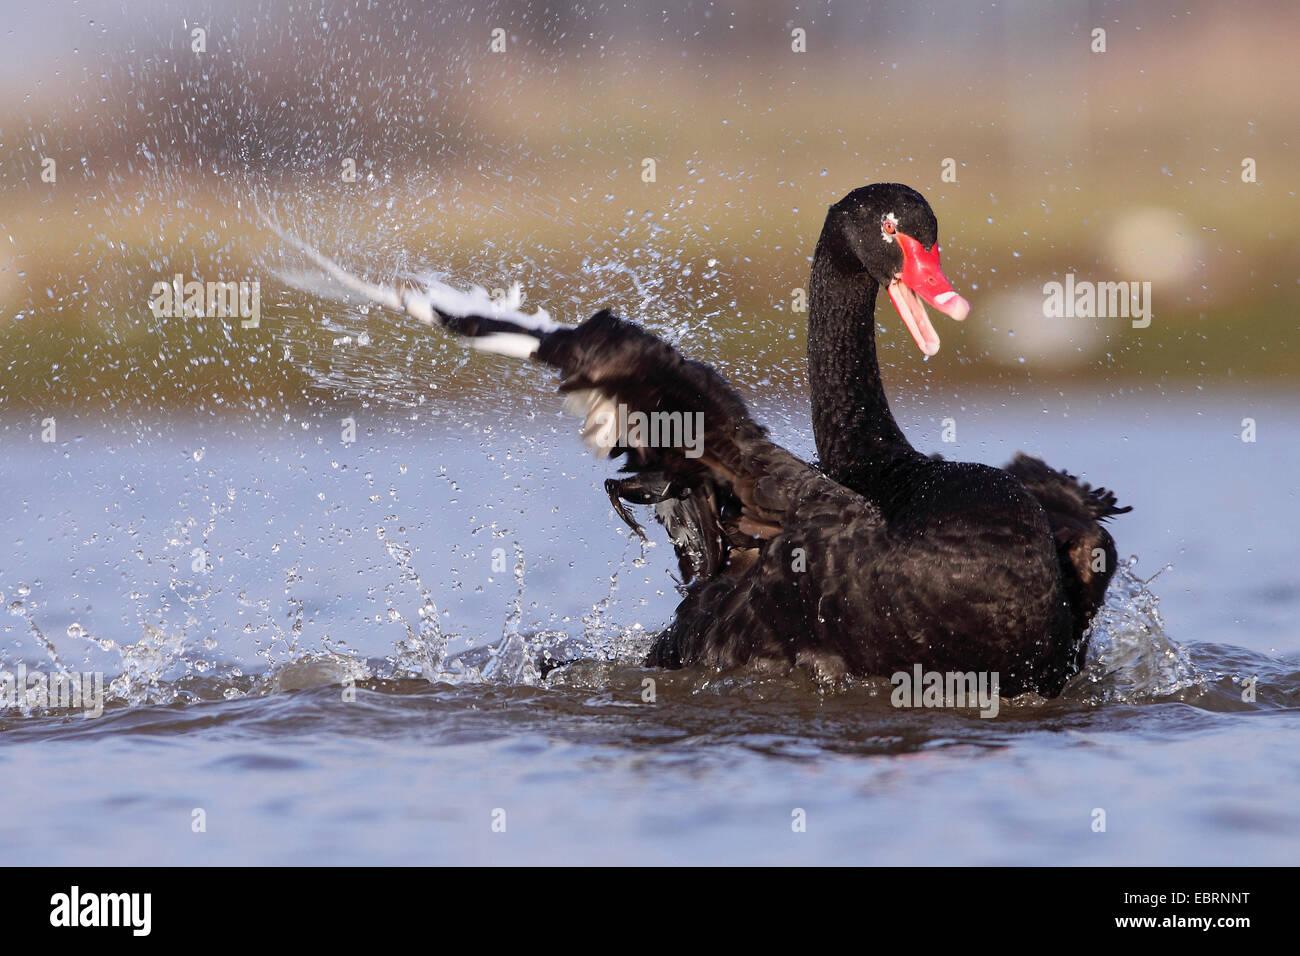 germany the black swan stockfotos germany the black swan bilder seite 2 alamy. Black Bedroom Furniture Sets. Home Design Ideas